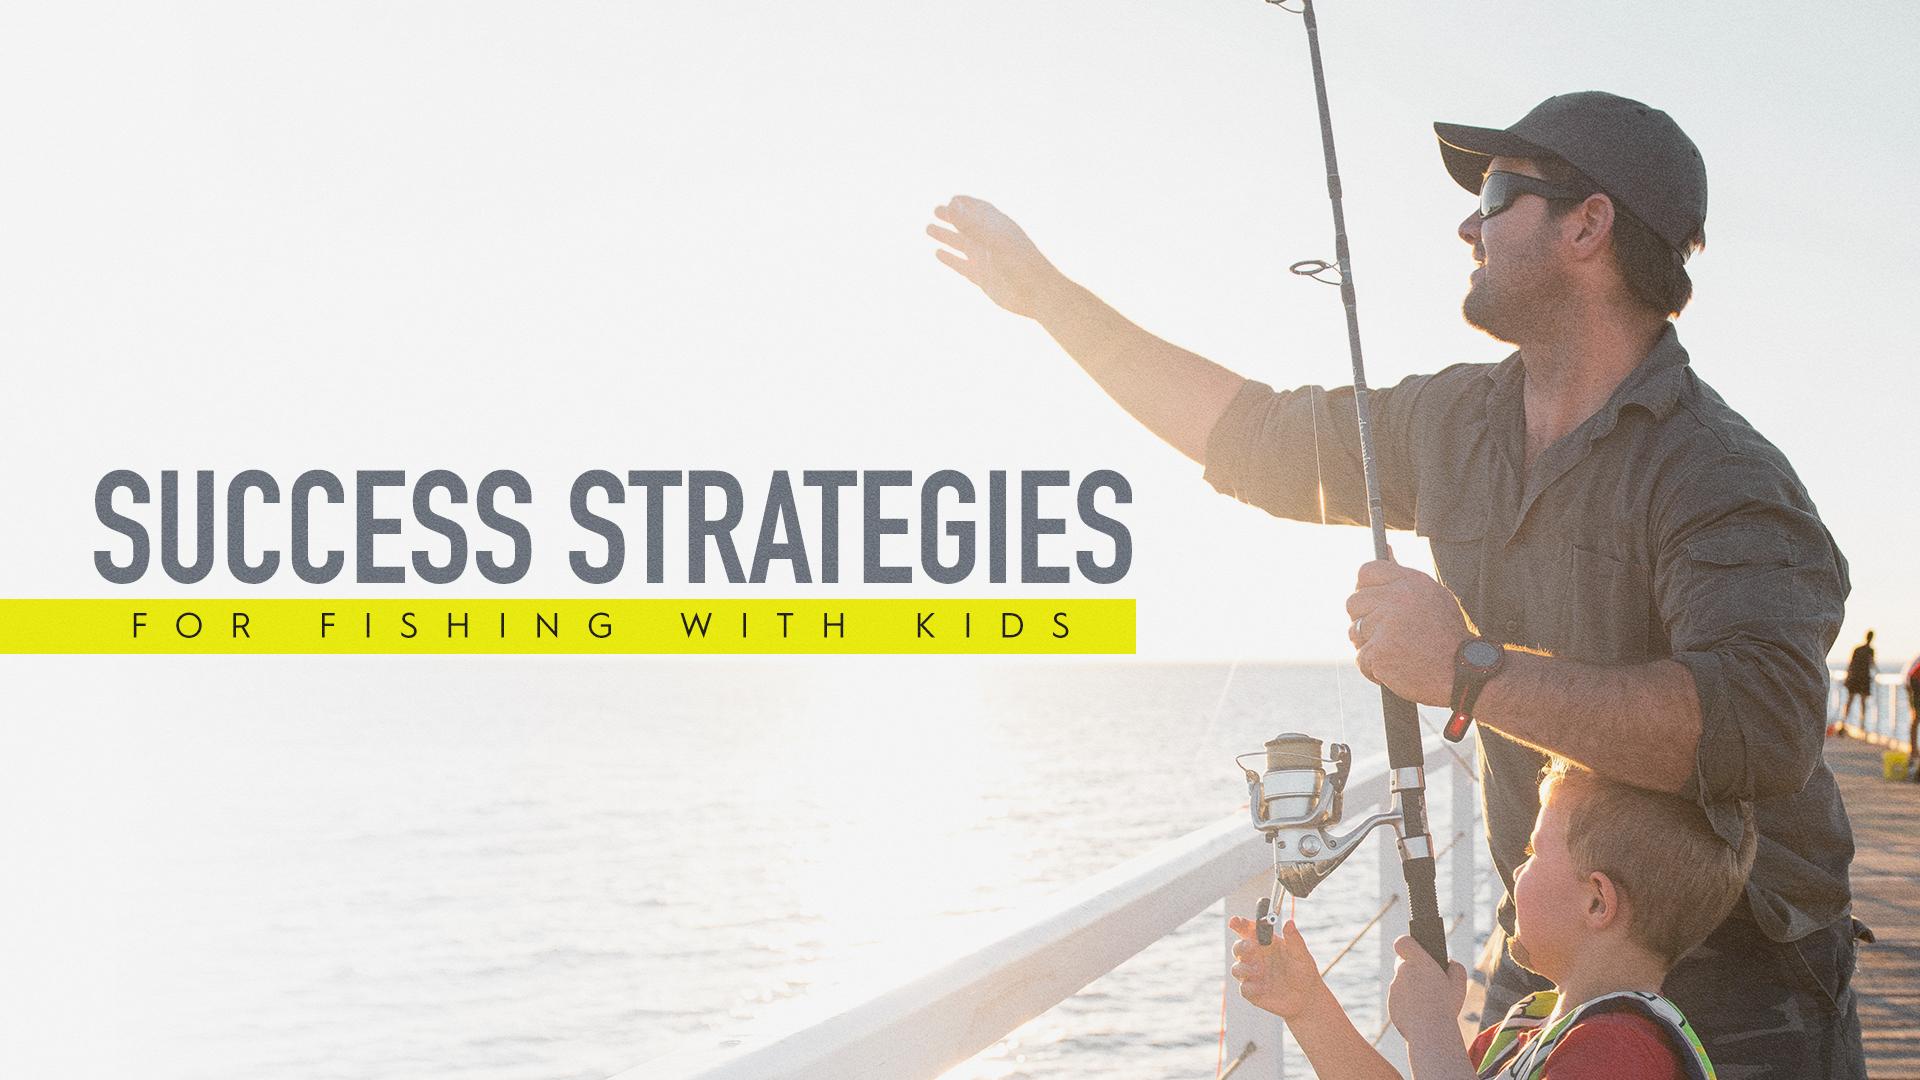 SUCCESS STRATEGIES FOR FISHING KIDS